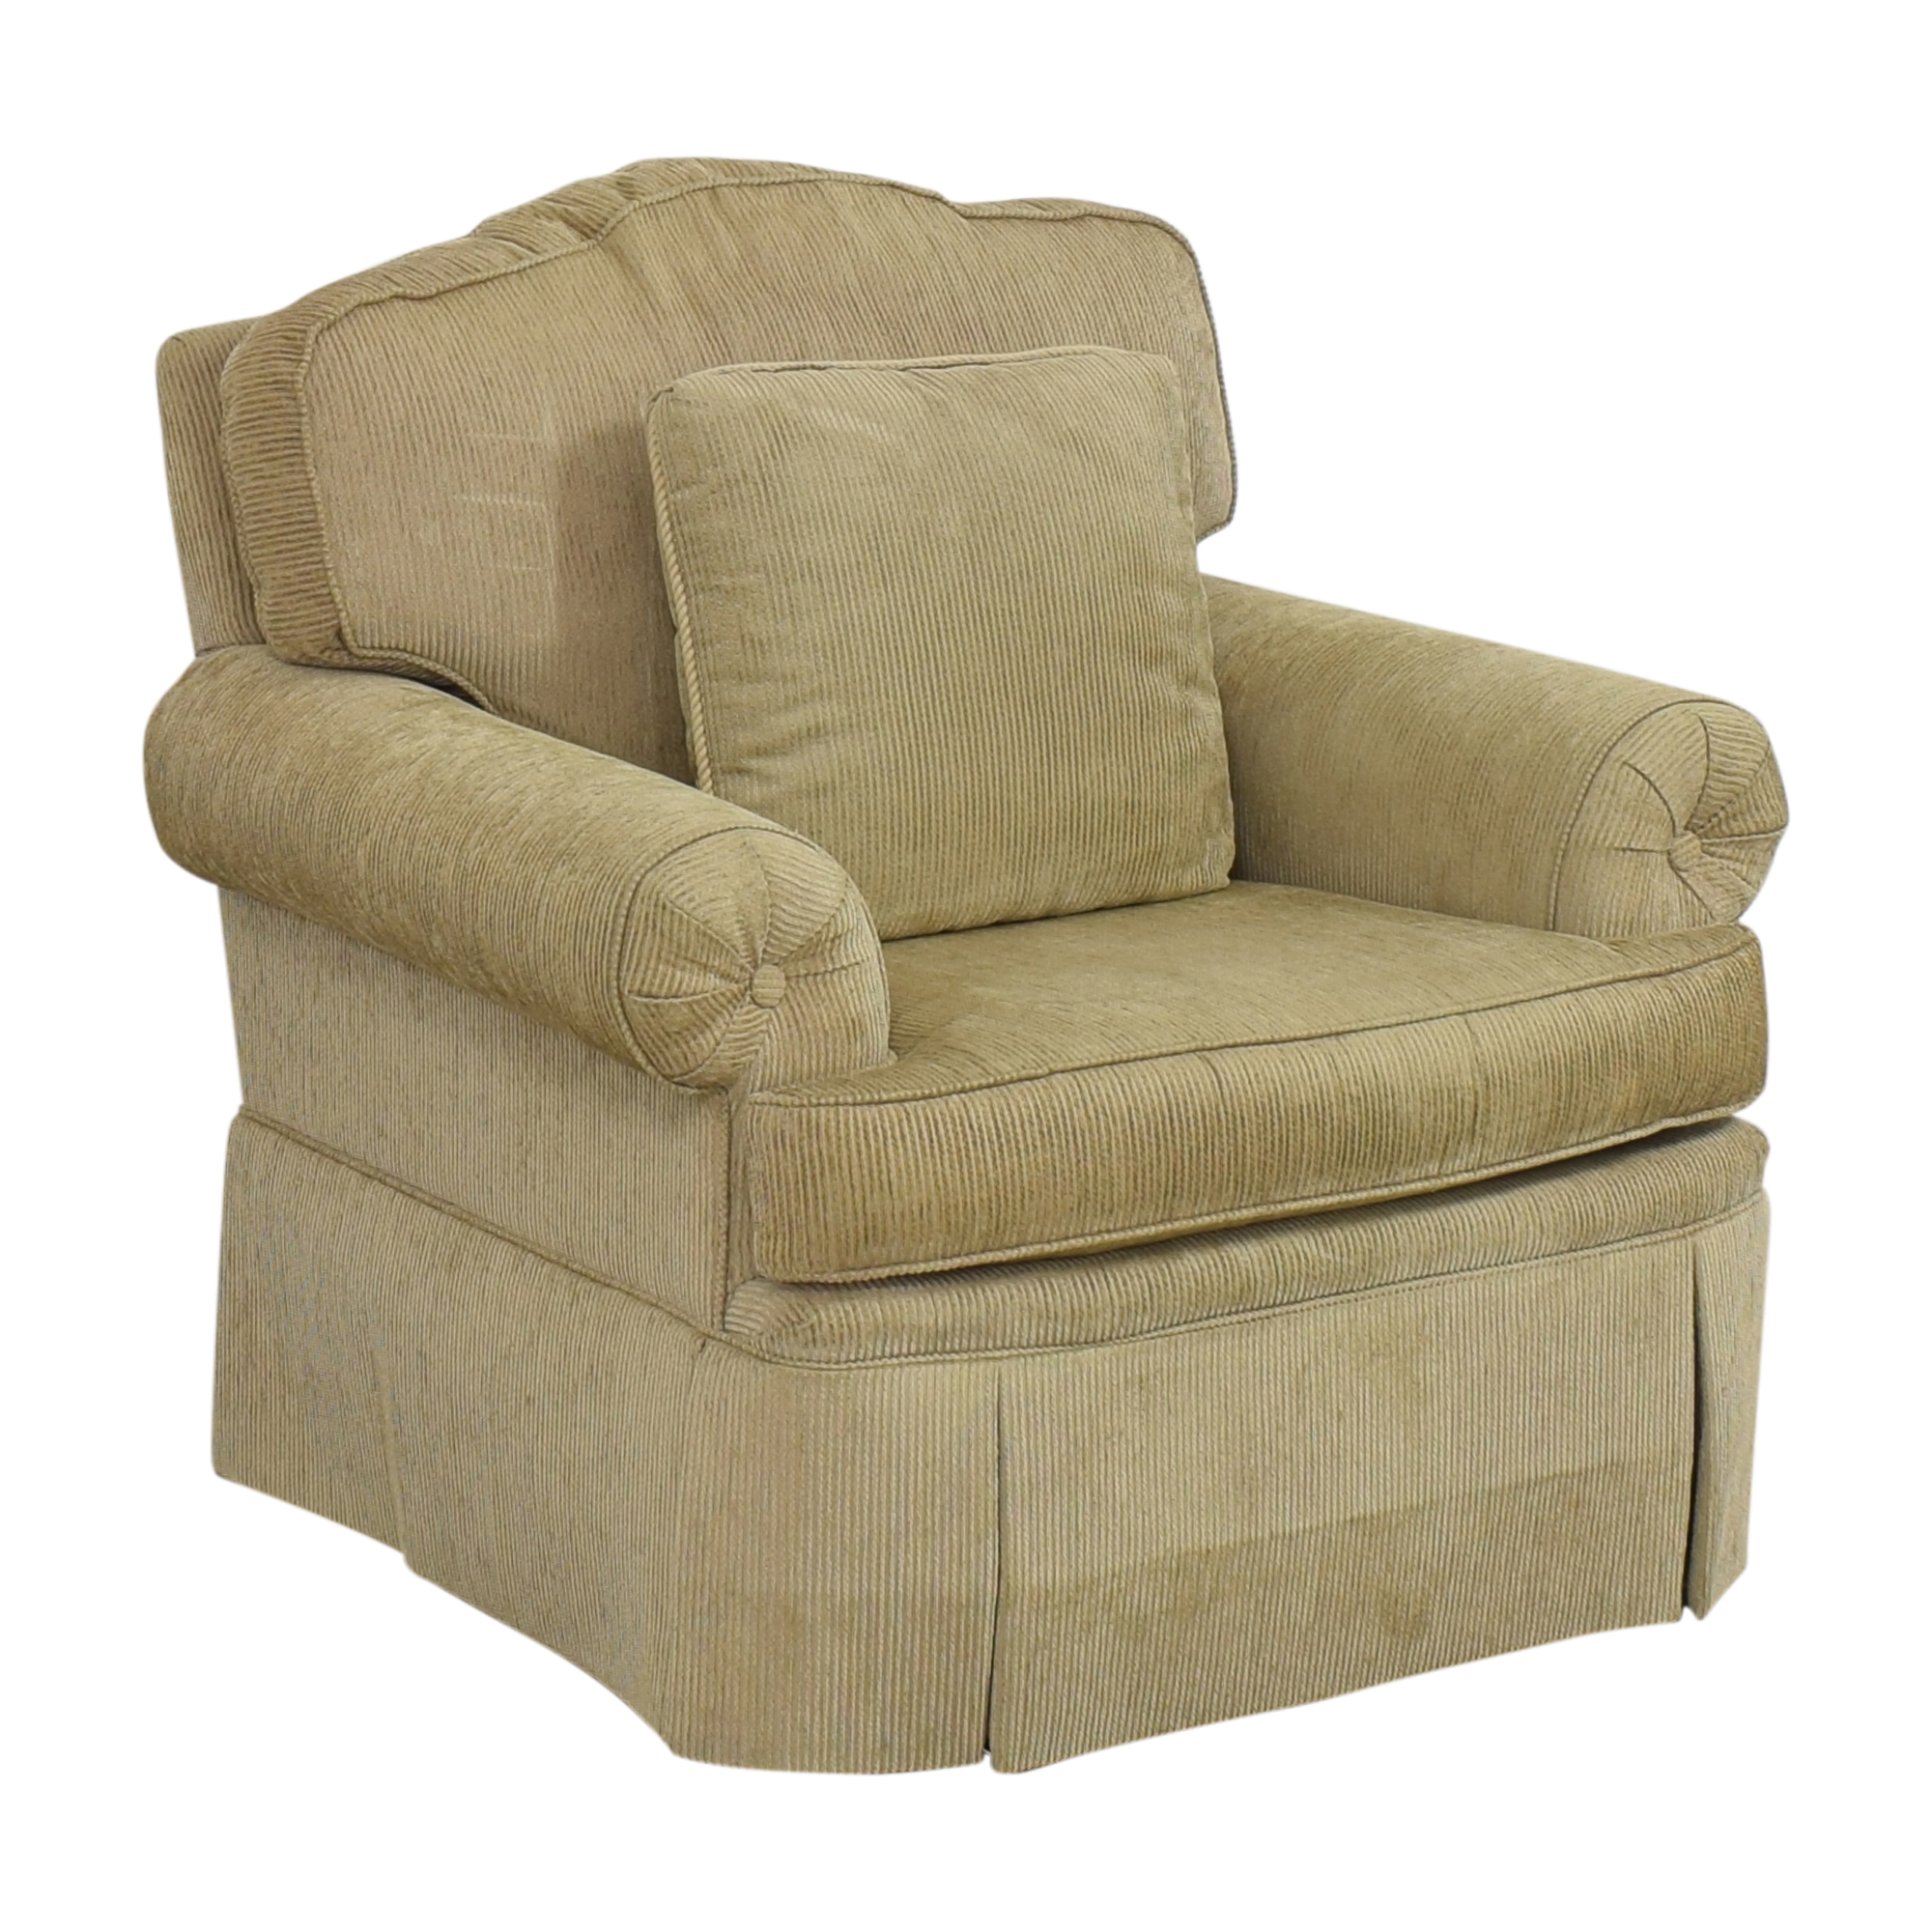 Drexel Heritage Skirted Club Chair sale